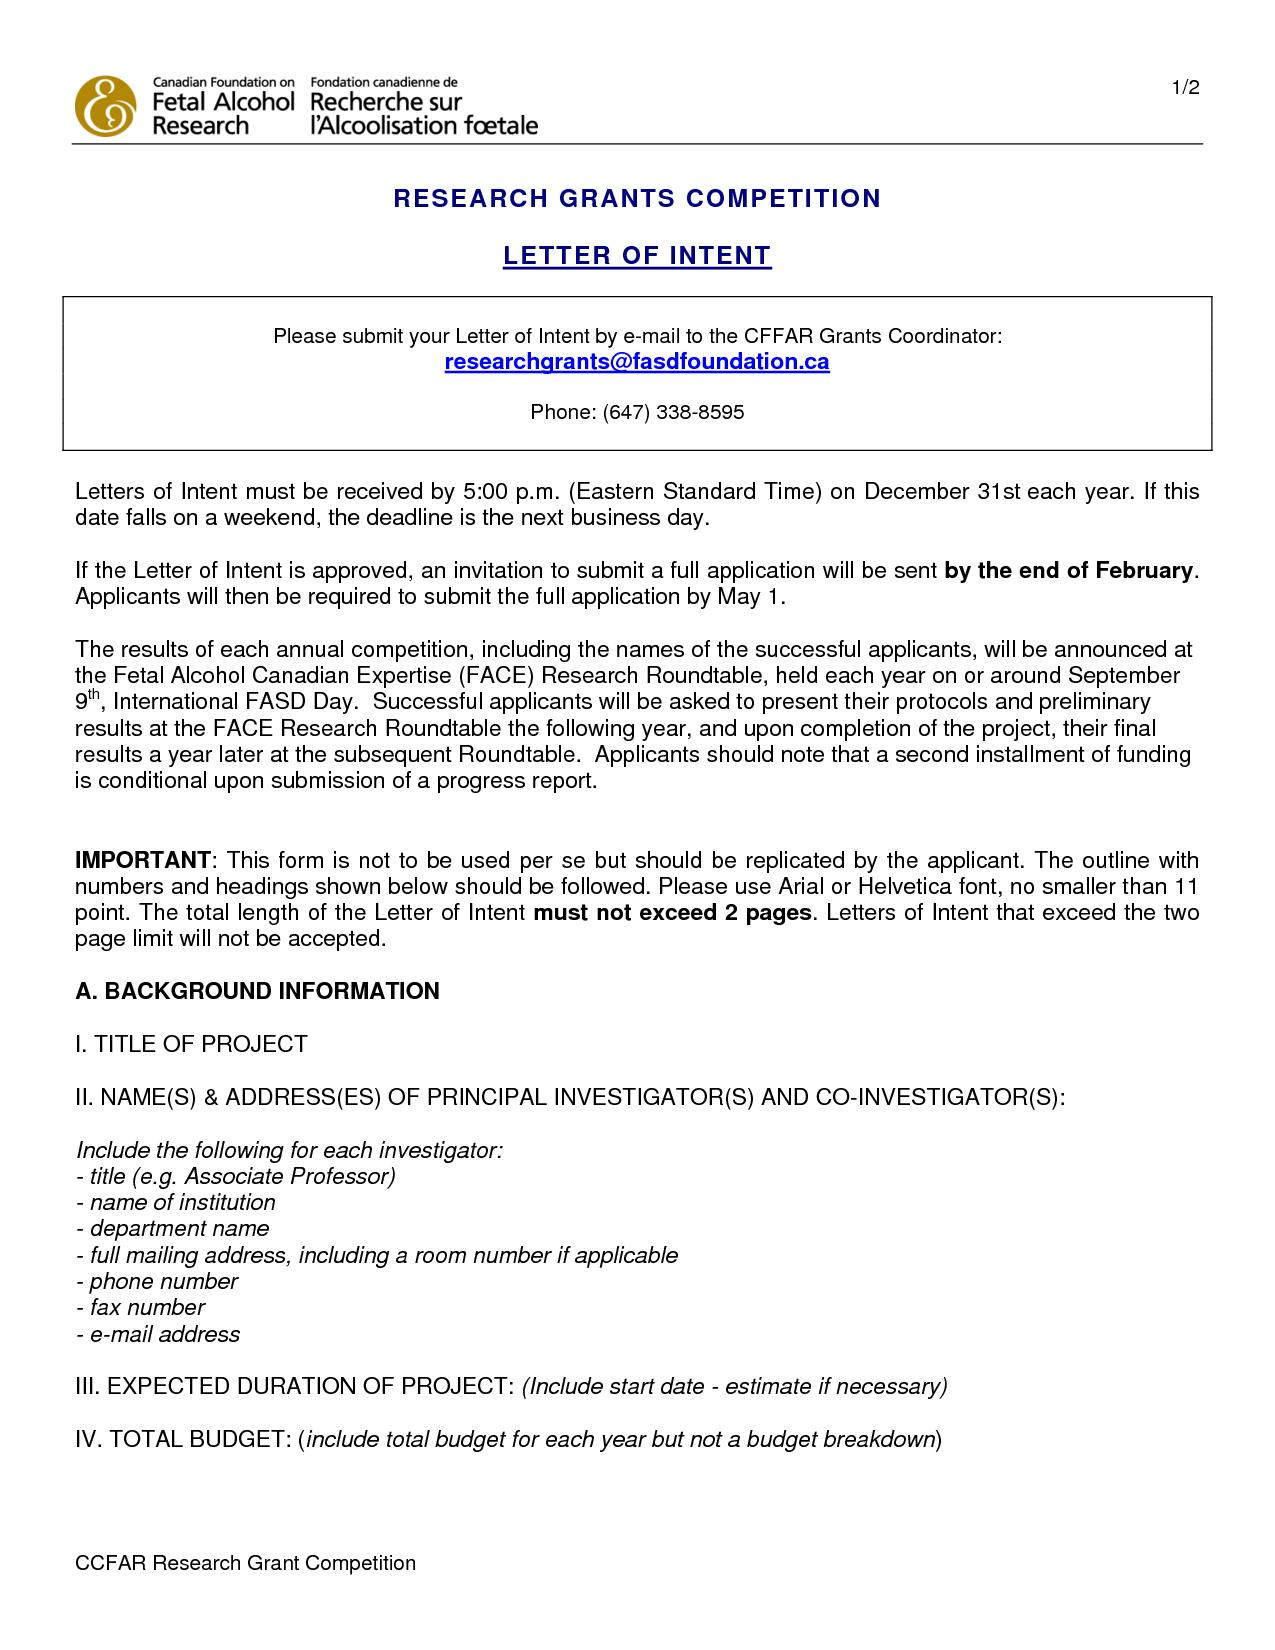 Fundraiser Proposal Letter Template